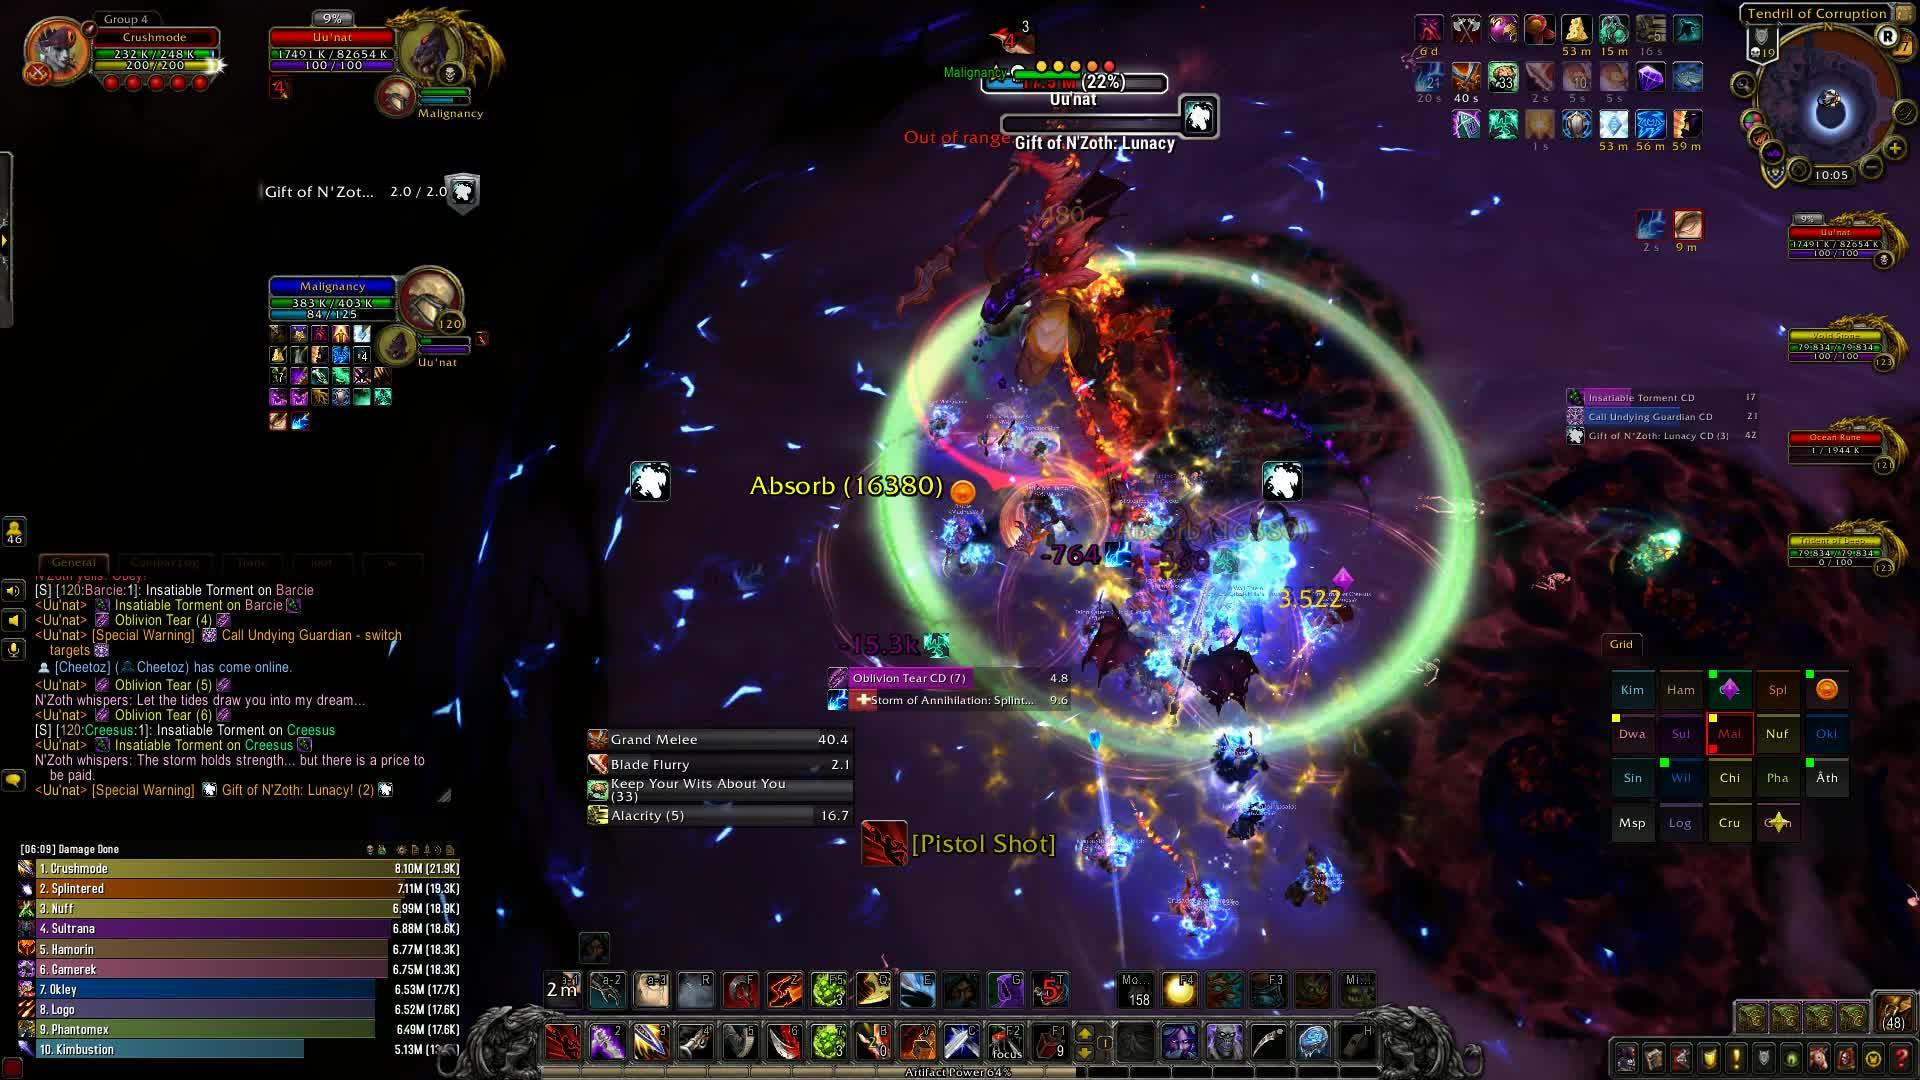 worldofwarcraft, World Of Warcraft 2019.04.17 - 22.07.33.03.DVR GIFs